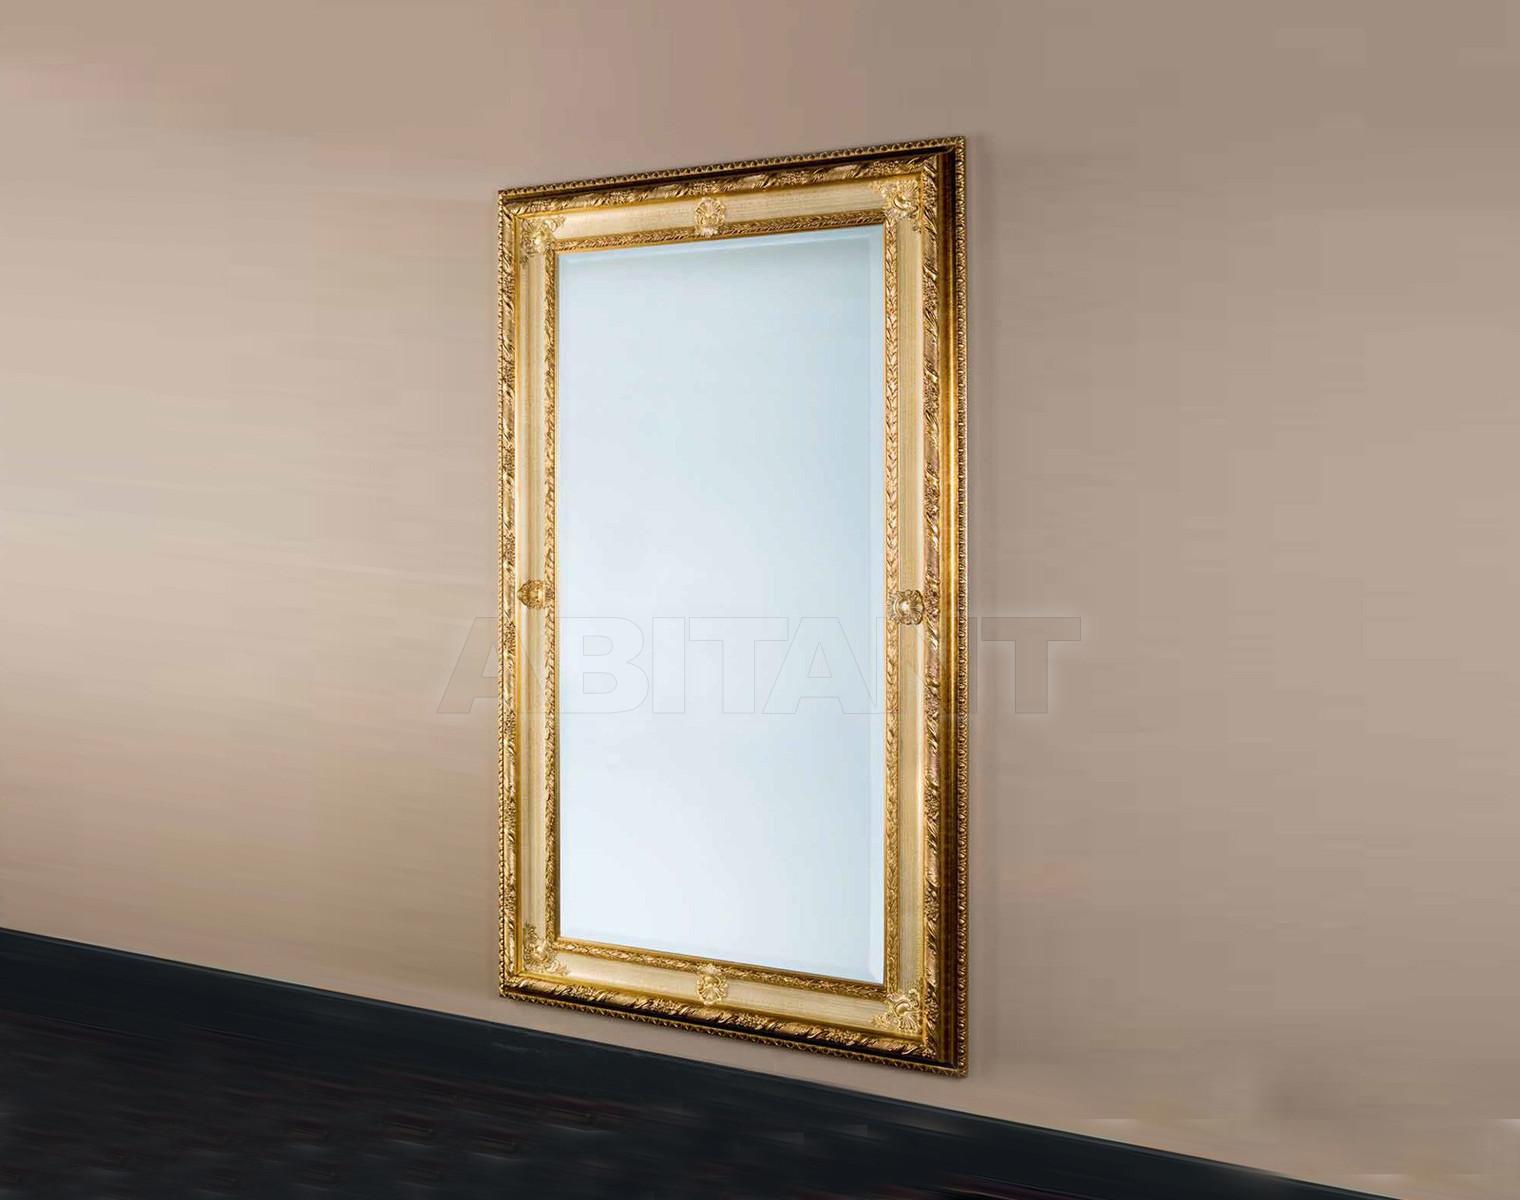 Купить Зеркало настенное Metamorfosi Specchiere 302